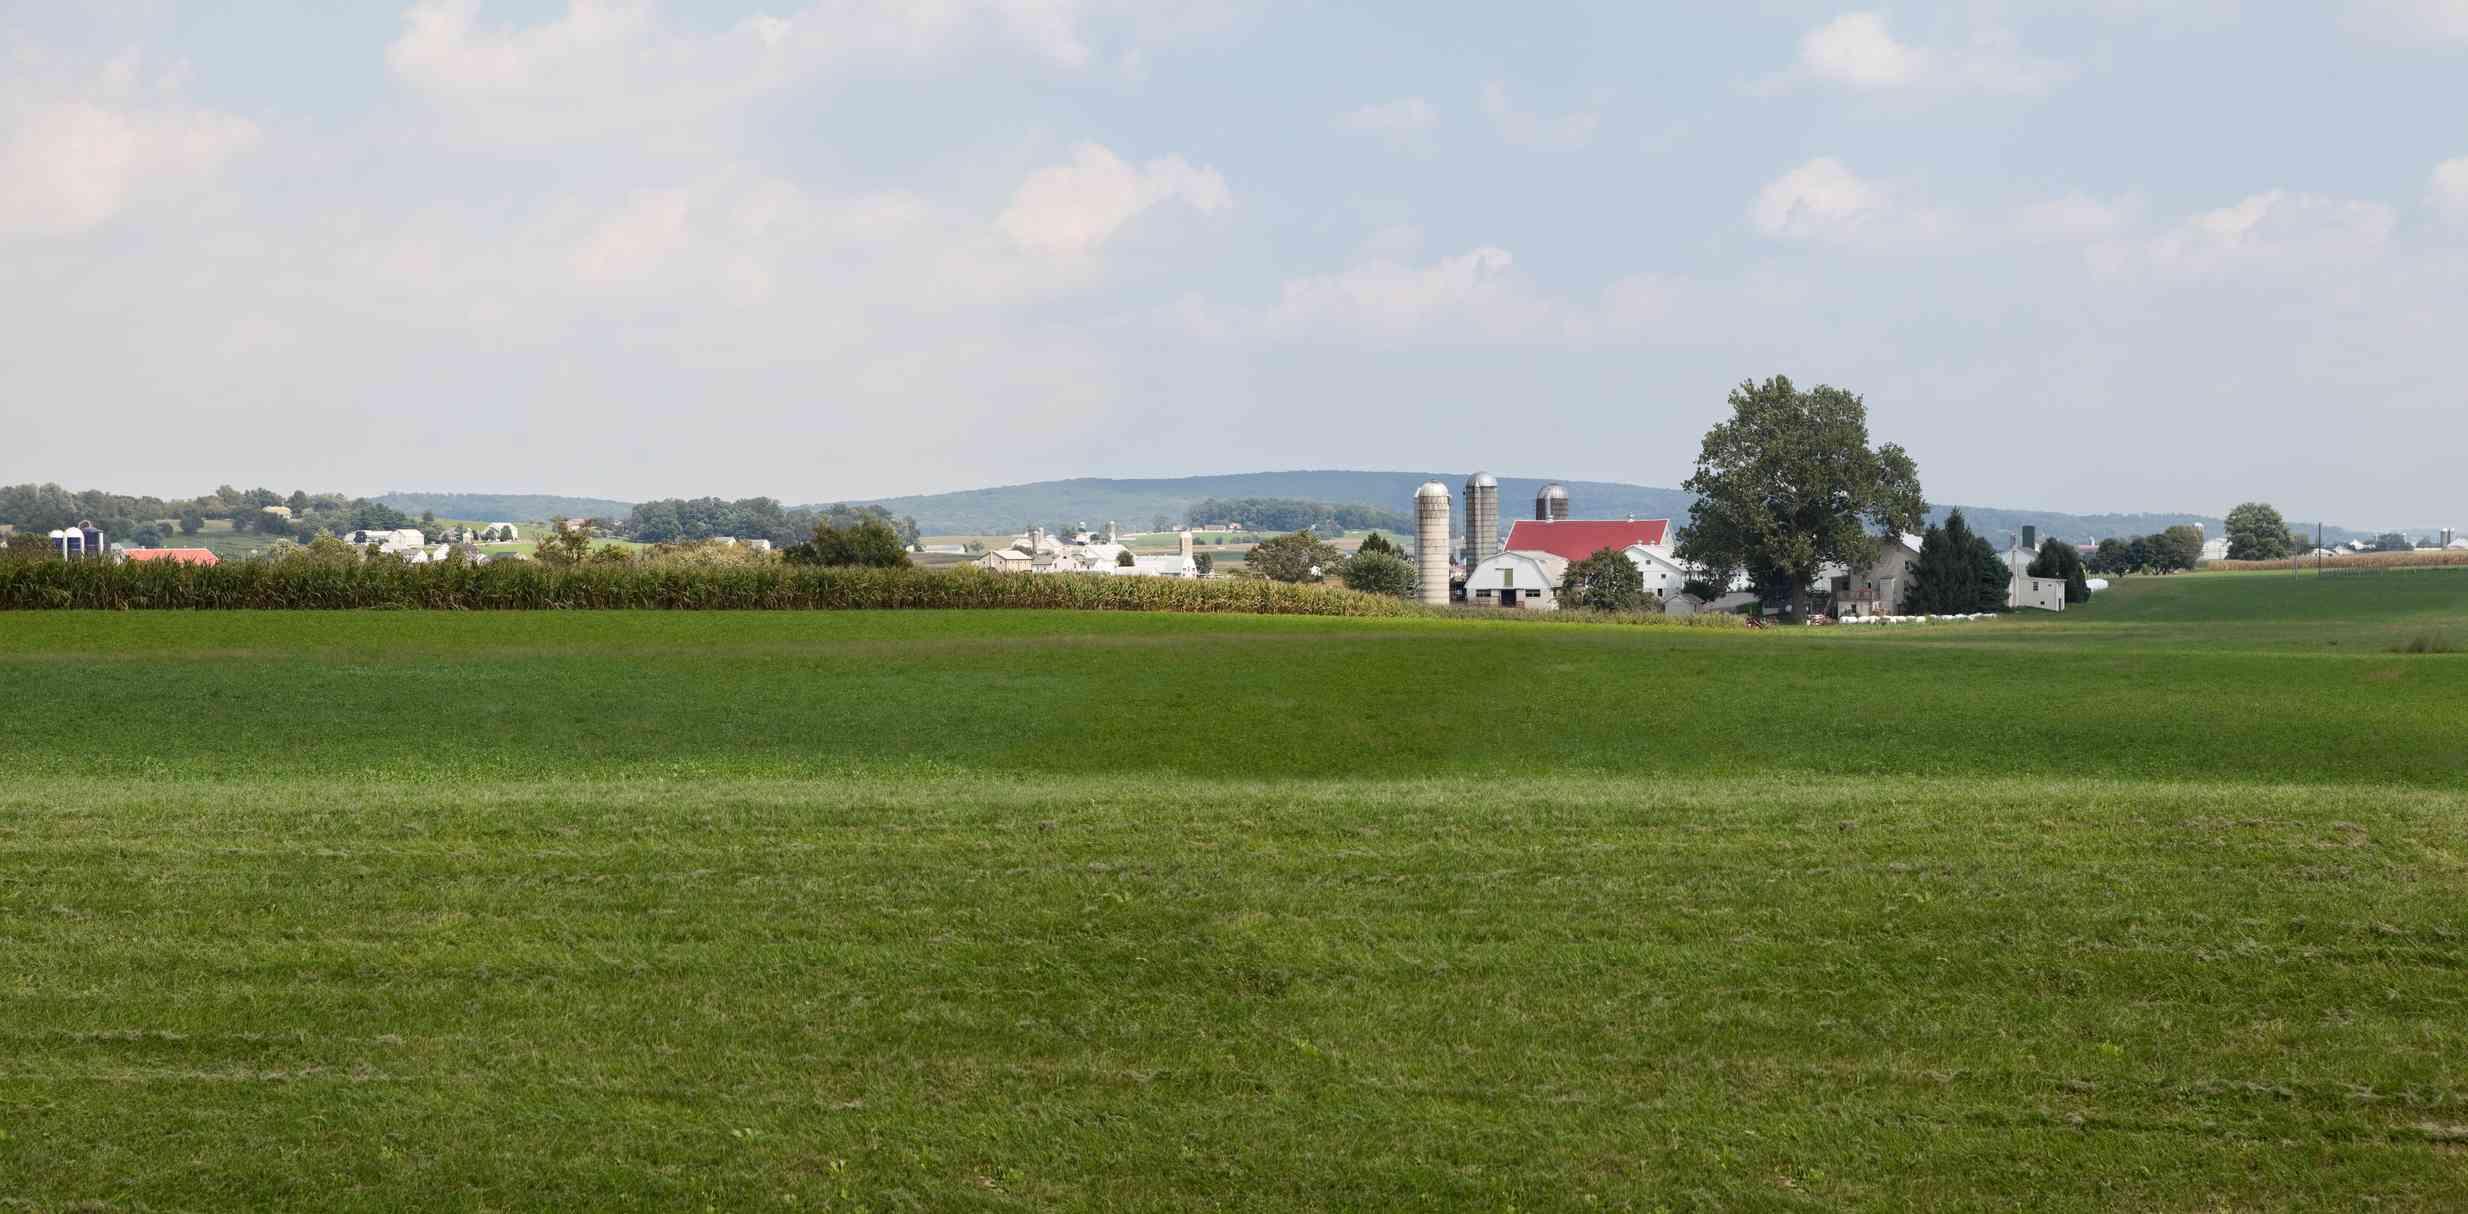 Farm in Lancaster, PA